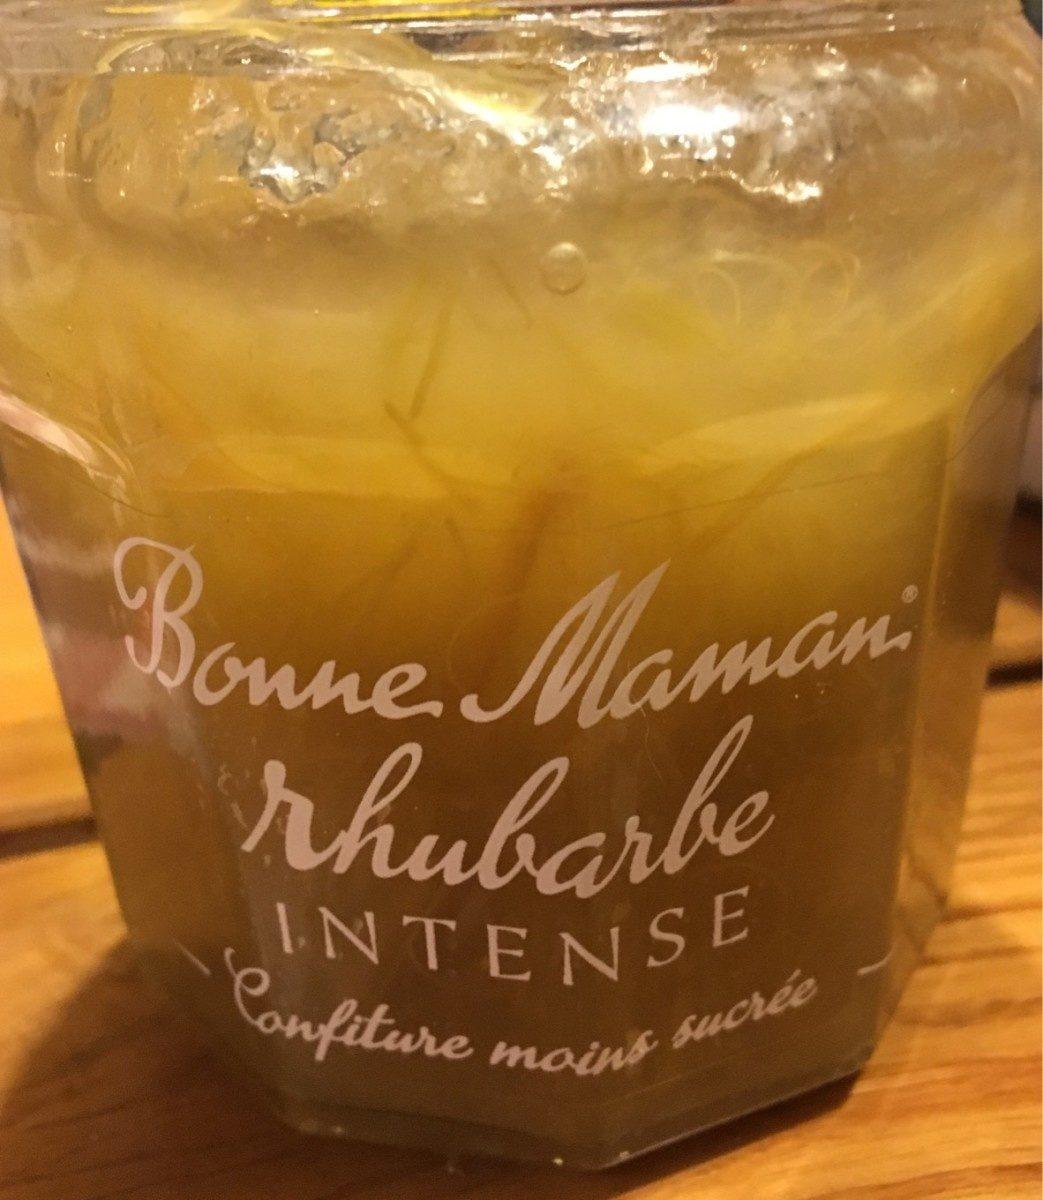 Rhubarbe intense - Product